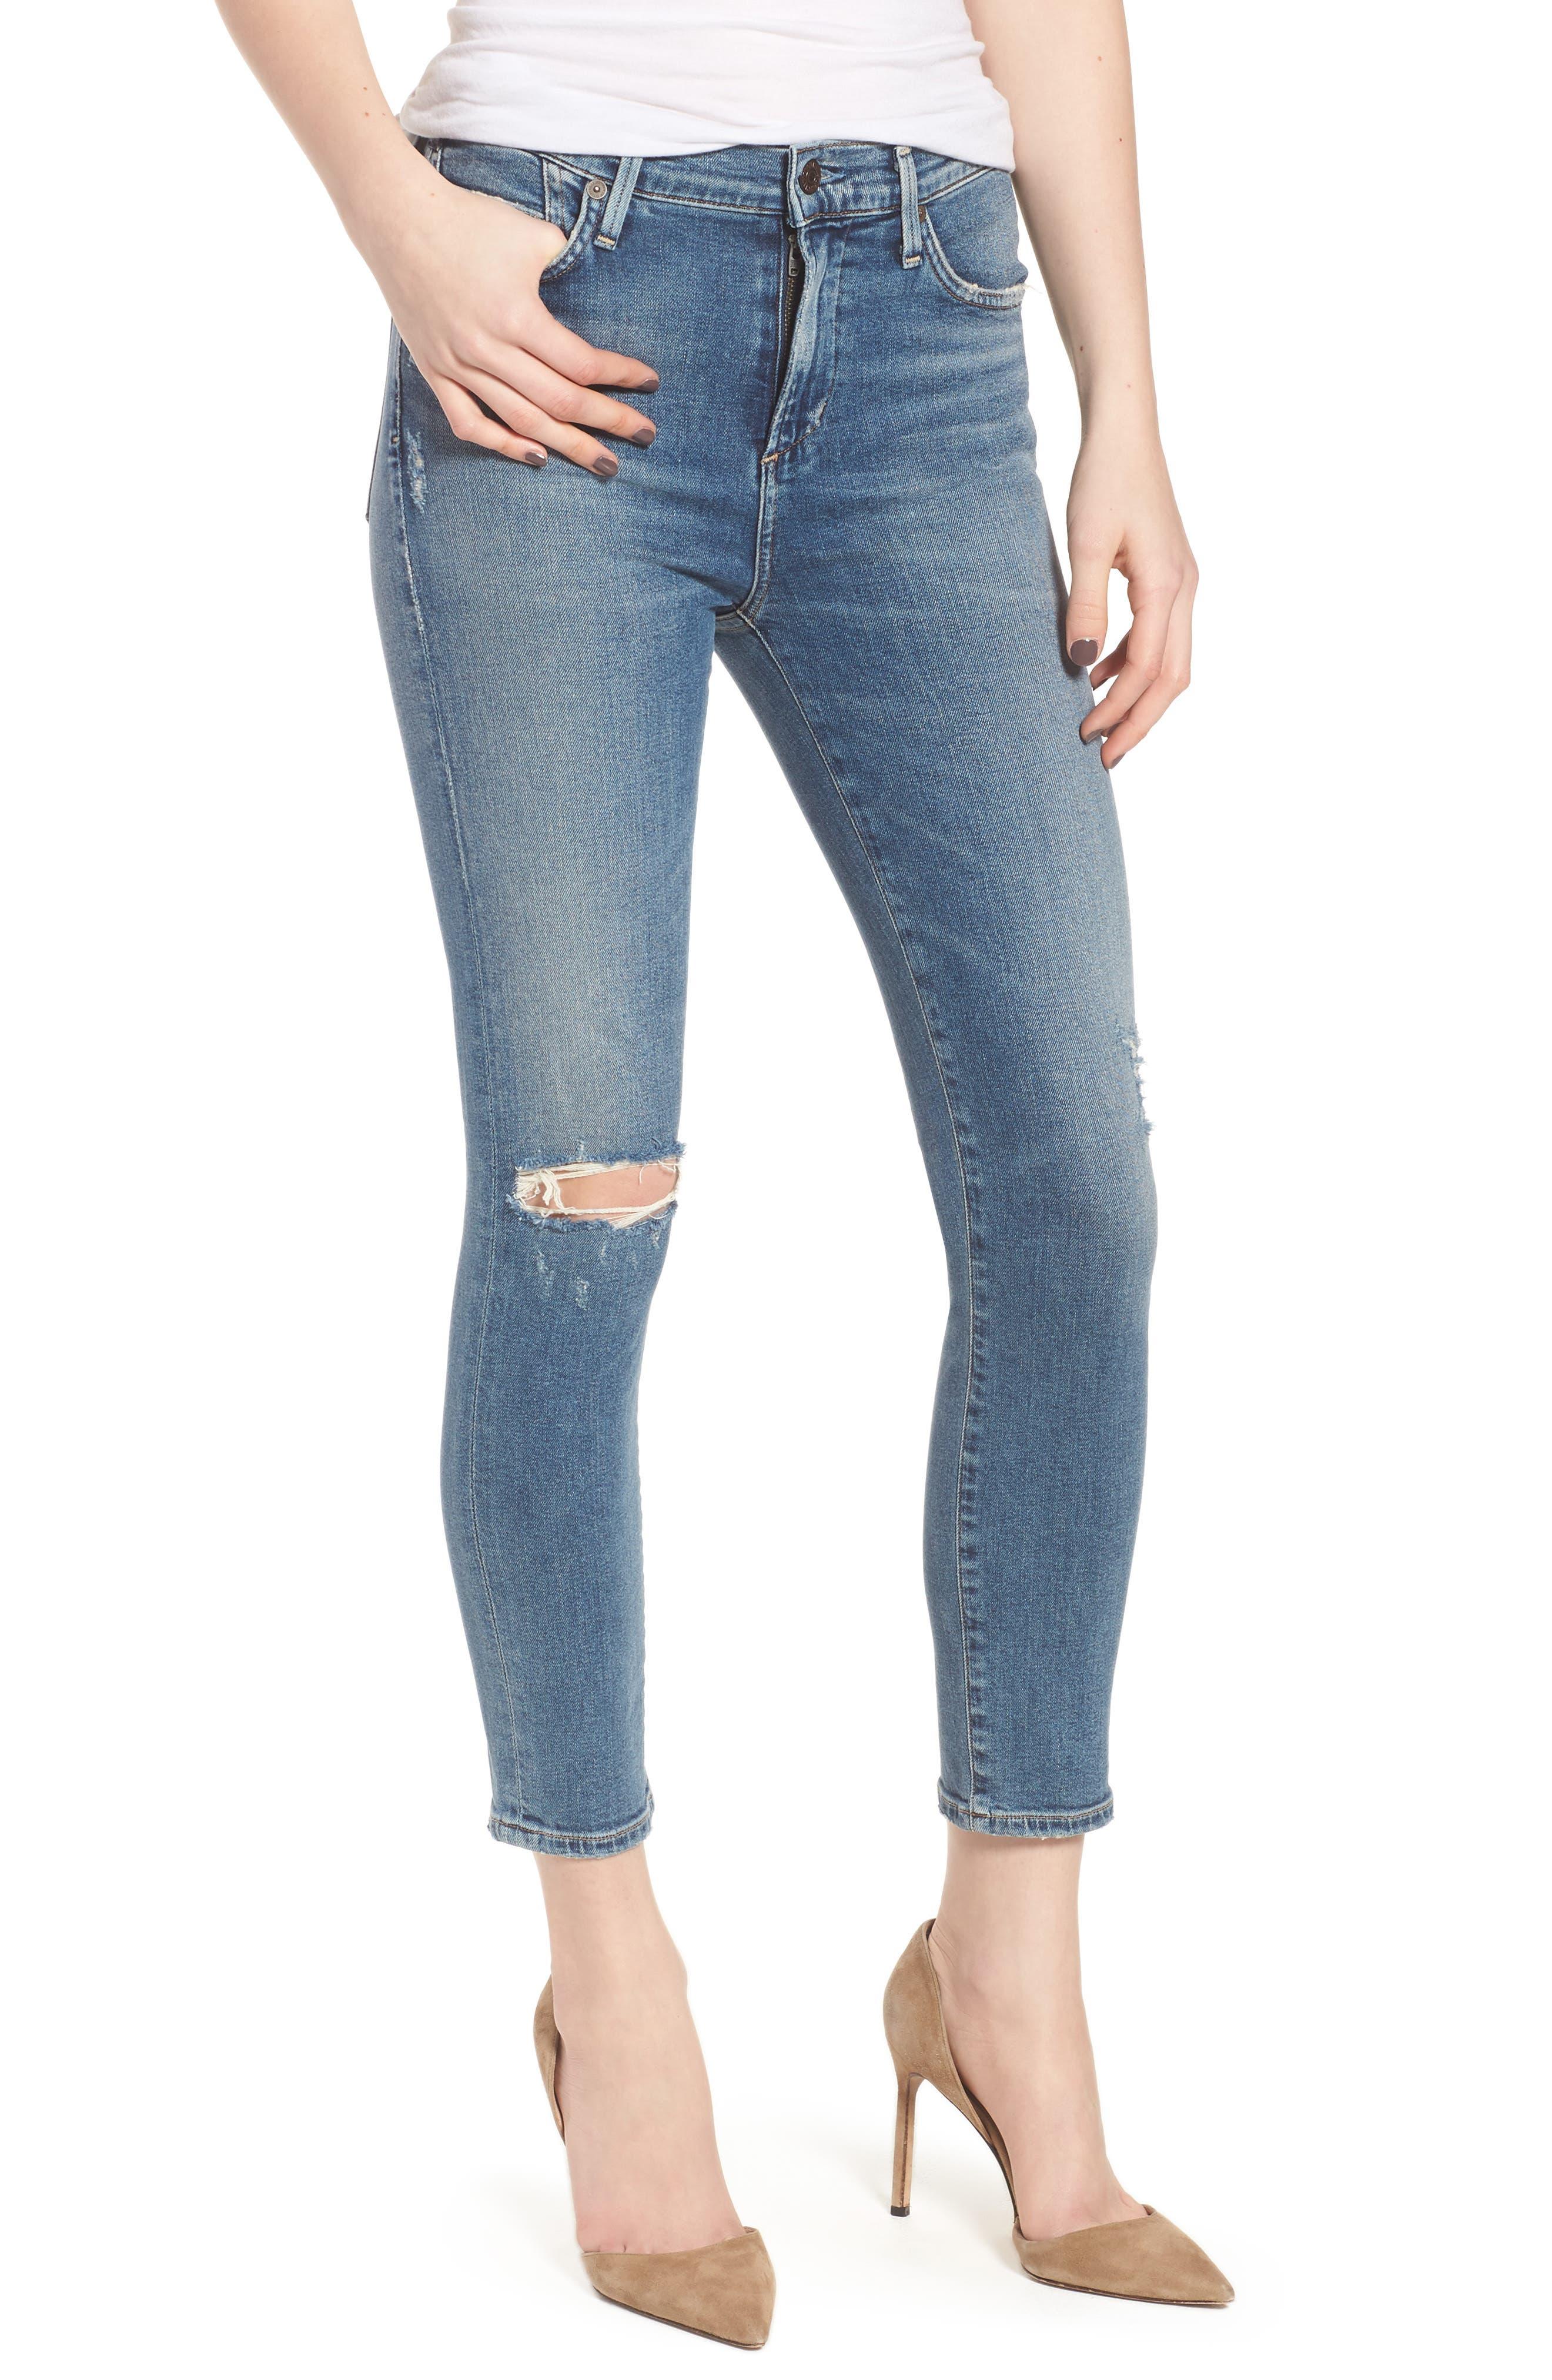 Rocket High Waist Crop Skinny Jeans,                             Main thumbnail 1, color,                             427